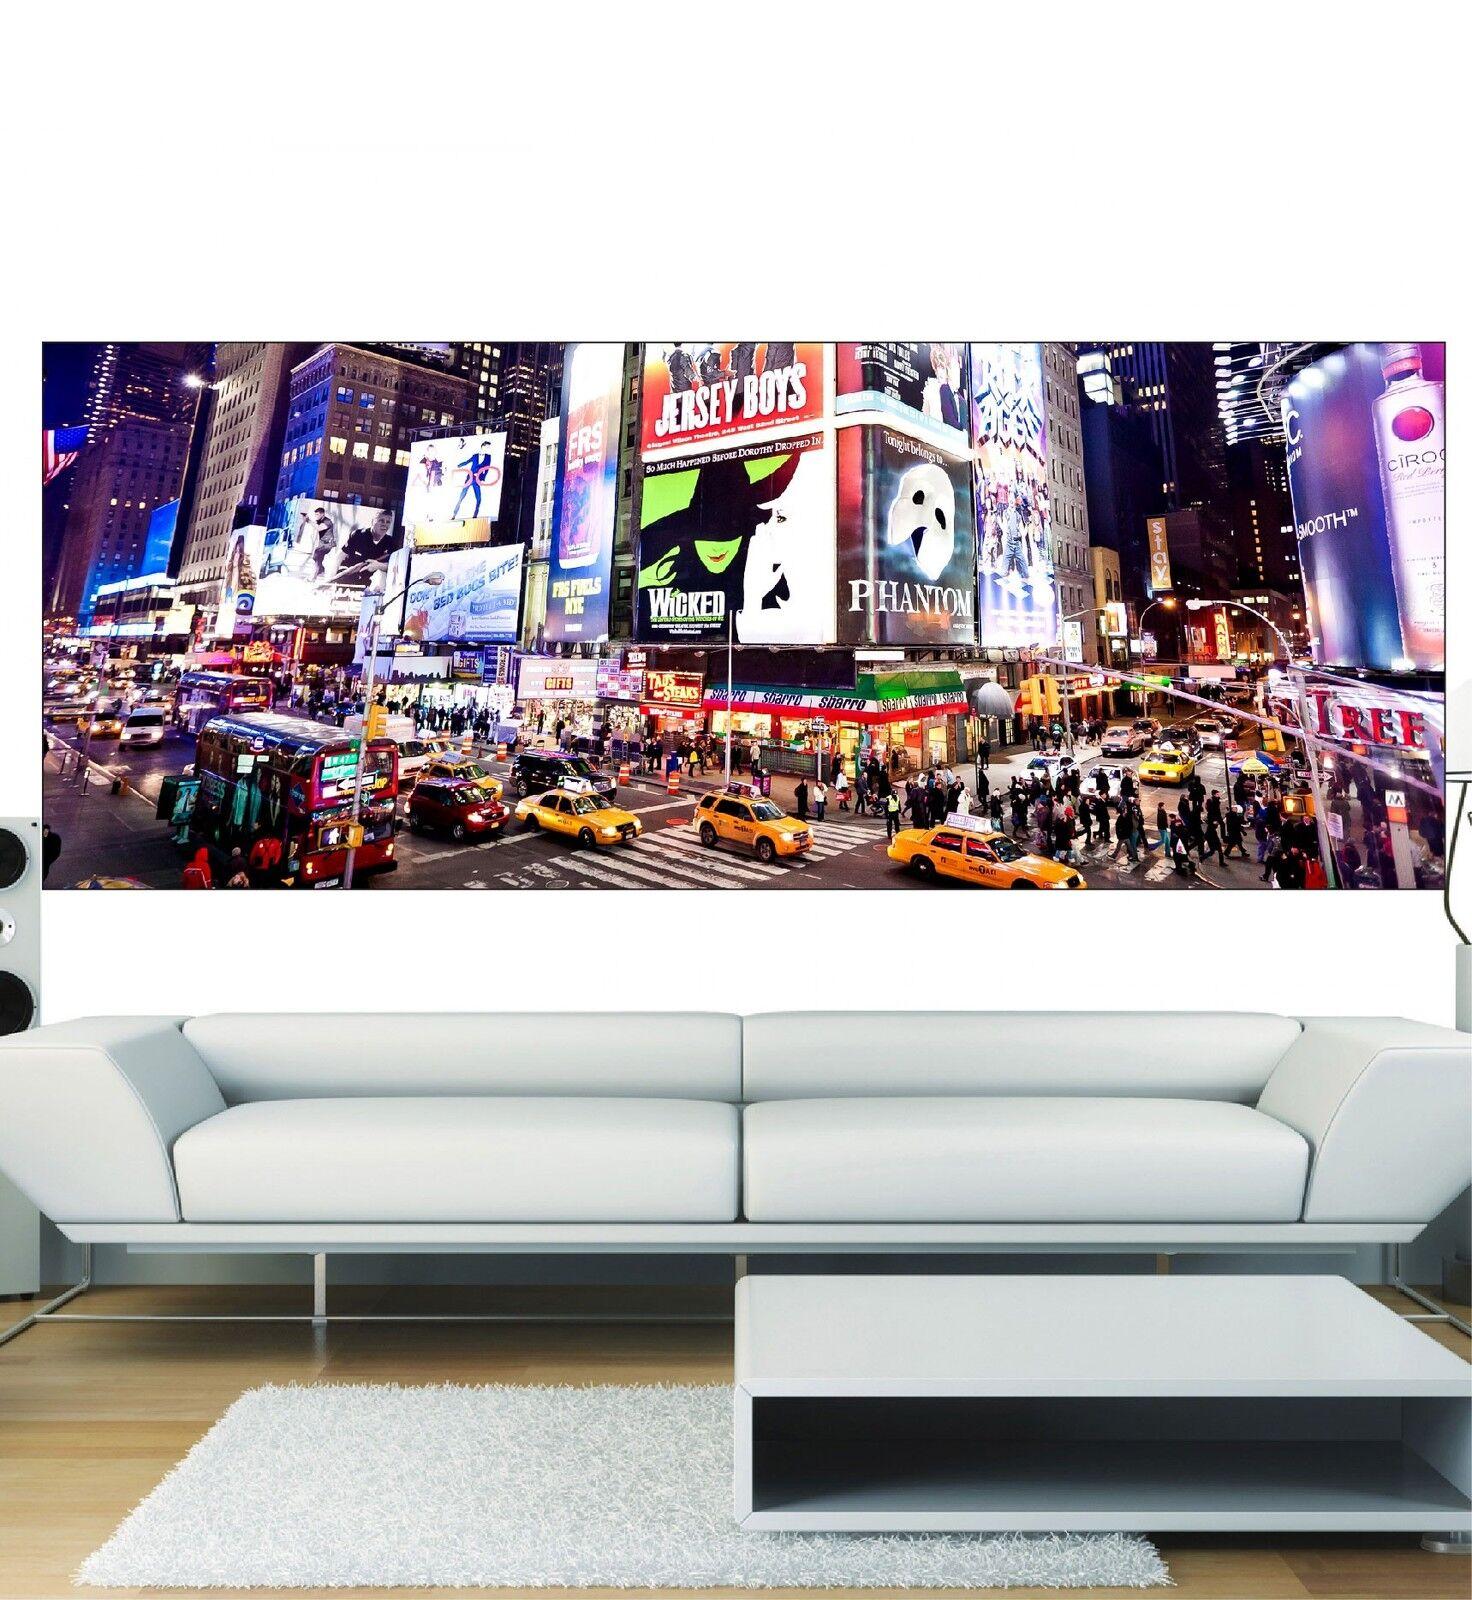 Papel pintado panorámica New 3623 York city 3623 New Arte decoración Pegatinas c2d525